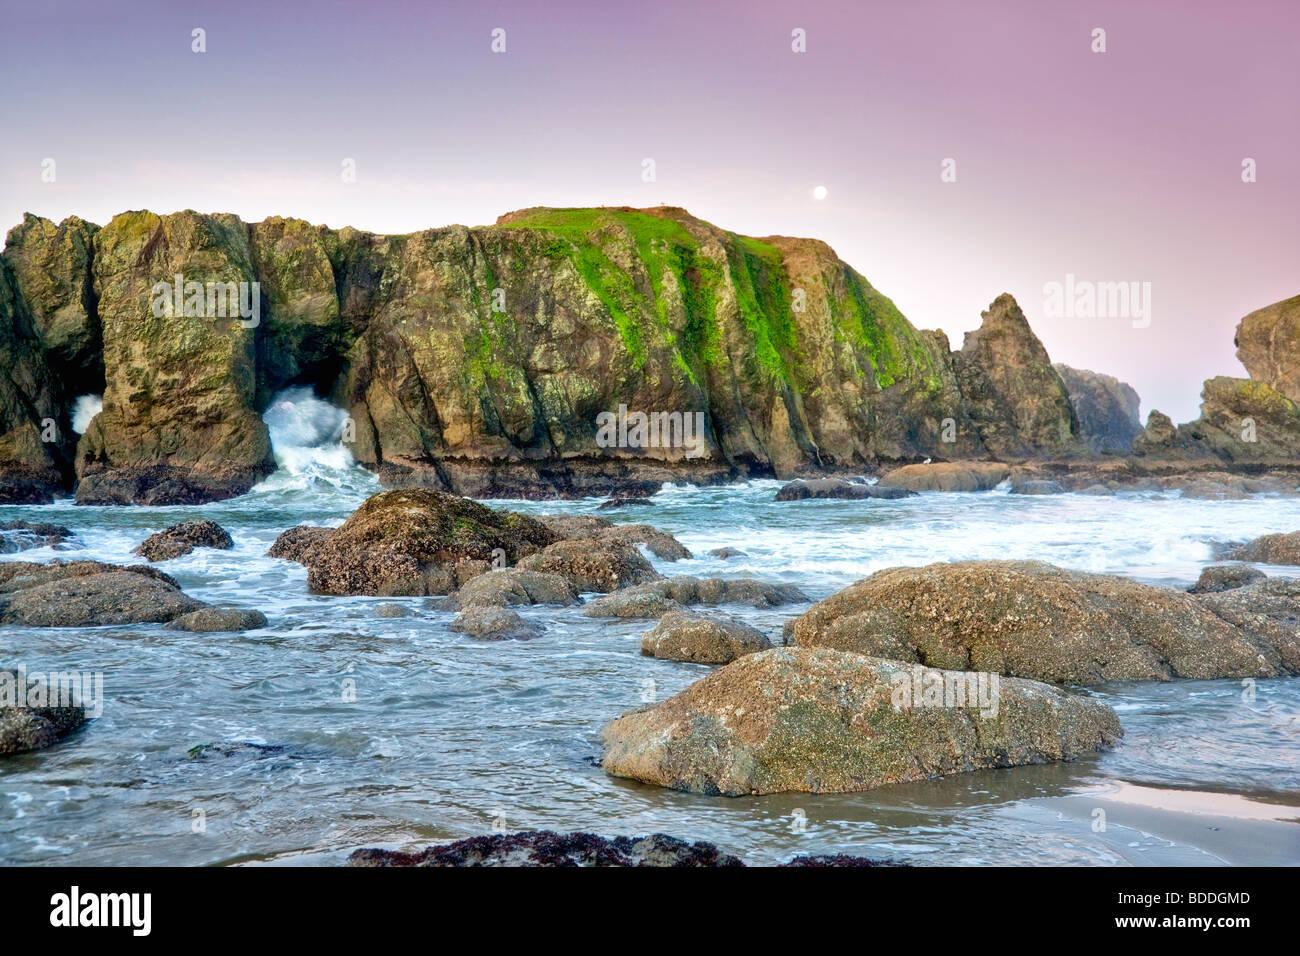 Rocks, moon, low tide and wave at Bandon beach. Oregon - Stock Image